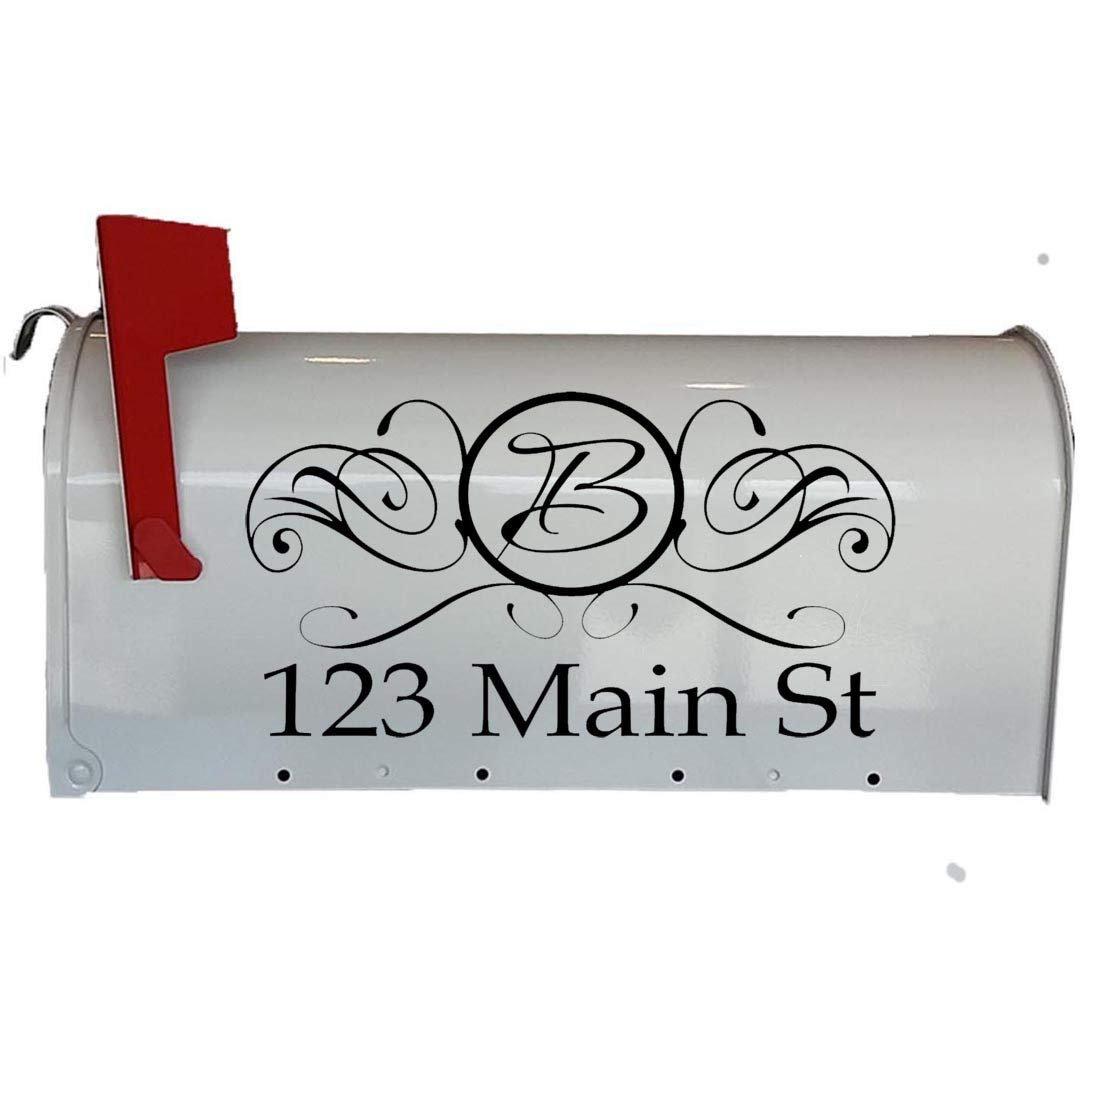 "MAILBOX CUSTOM LETTERING ADDRESS 5/"" X 9/"" Decal Sticker Name Street SET OF 2"